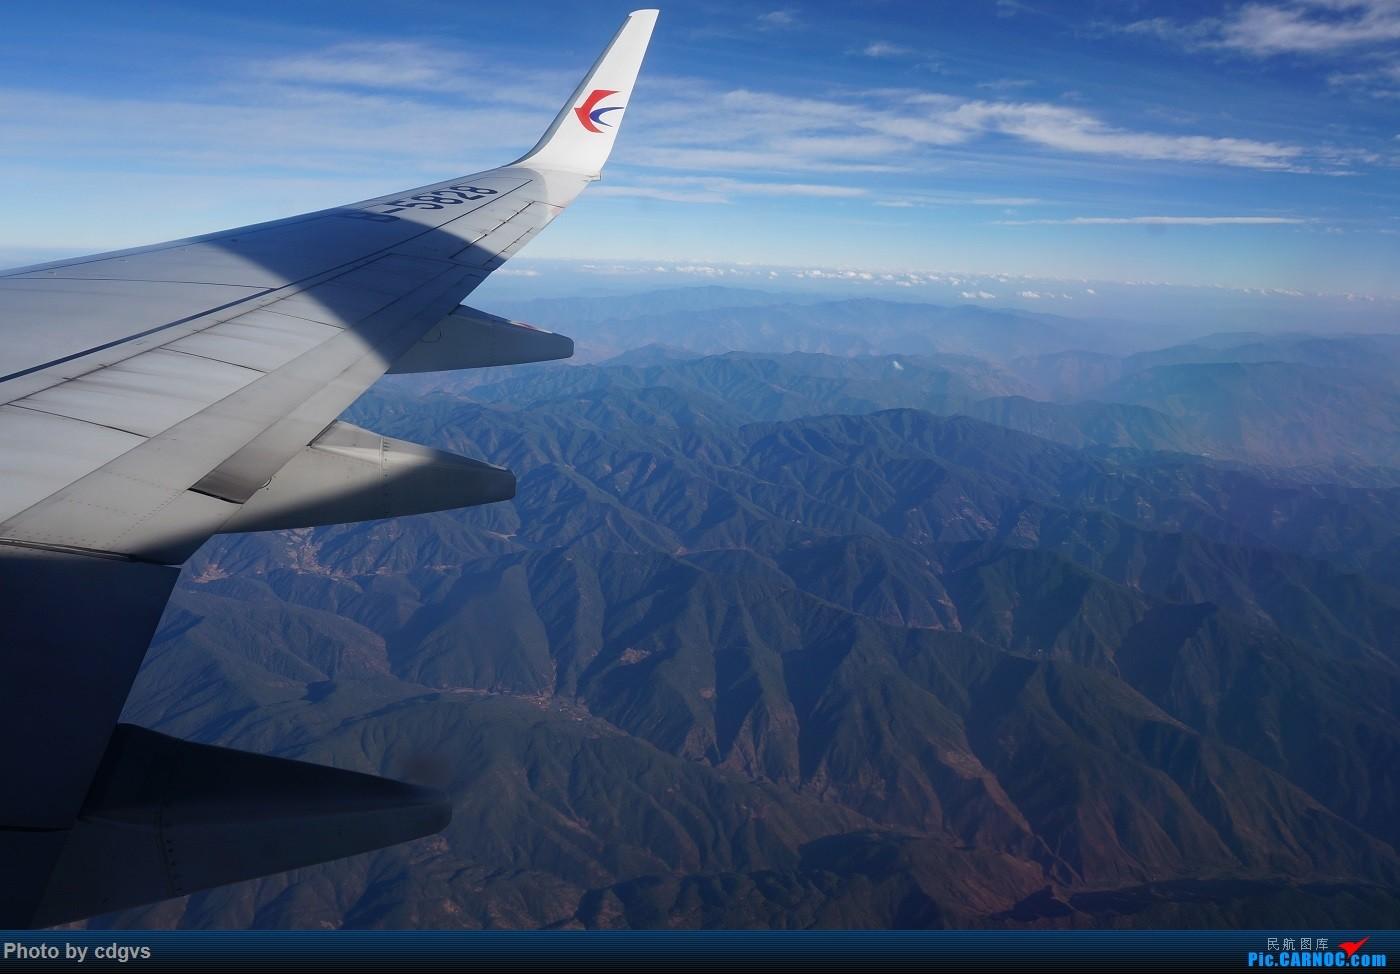 Re:[原创]KMG-LJG-KMG 东航&南航 省内刷航段,飞空客波音两种不同机型